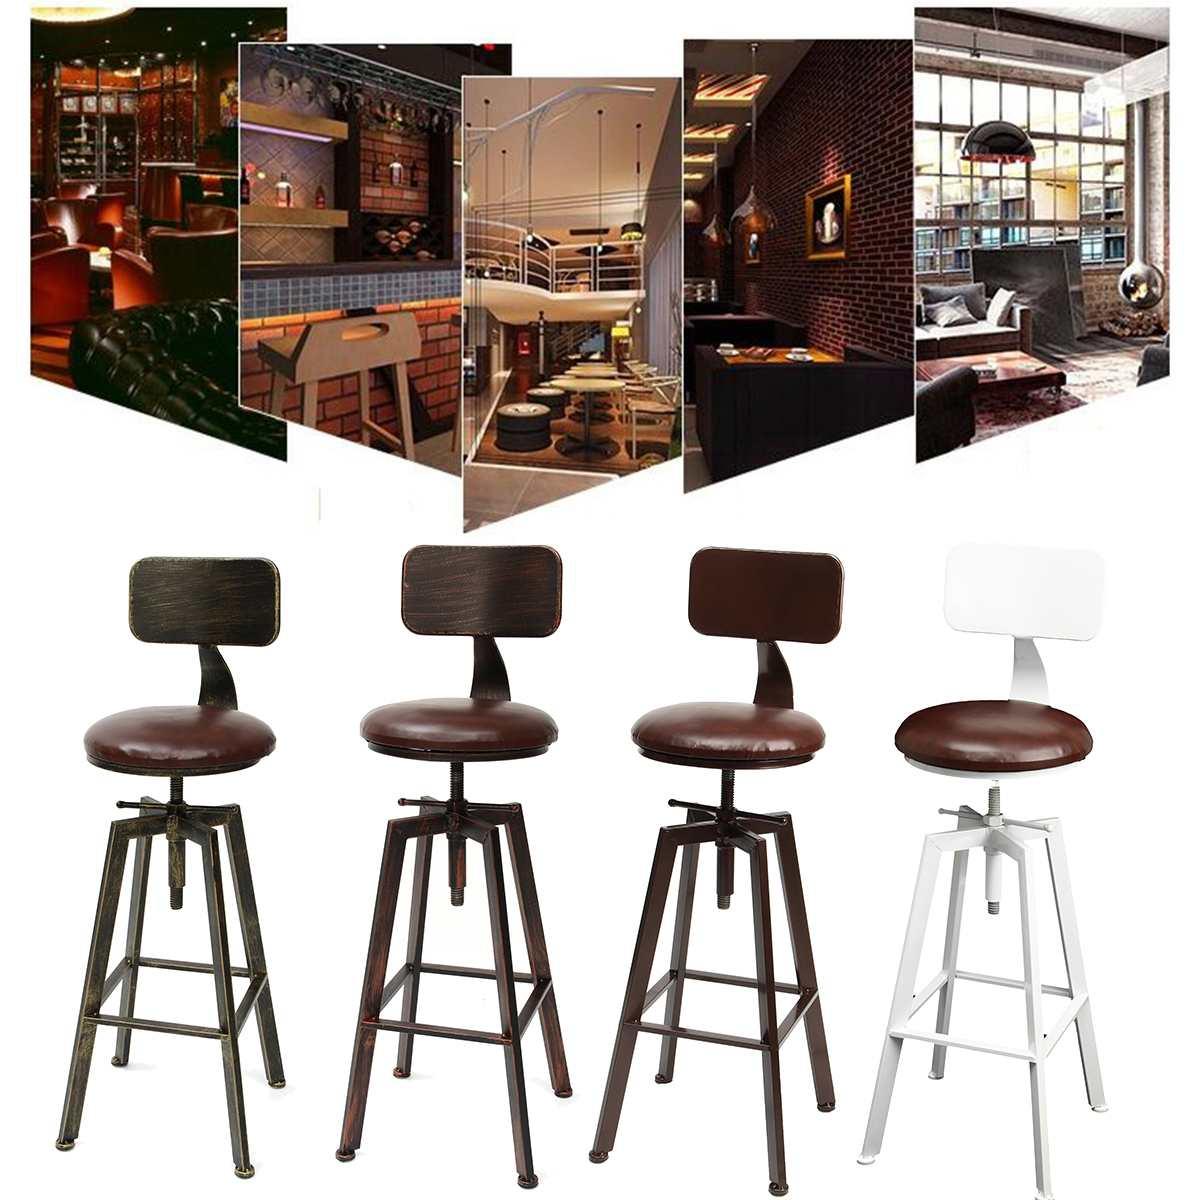 Bar Chairs Kruk Sandalyeler Sedie Taburete Bancos Moderno Stuhl Banqueta Todos Tipos Silla Tabouret De Moderne Stool Modern Bar Chair Beneficial To Essential Medulla